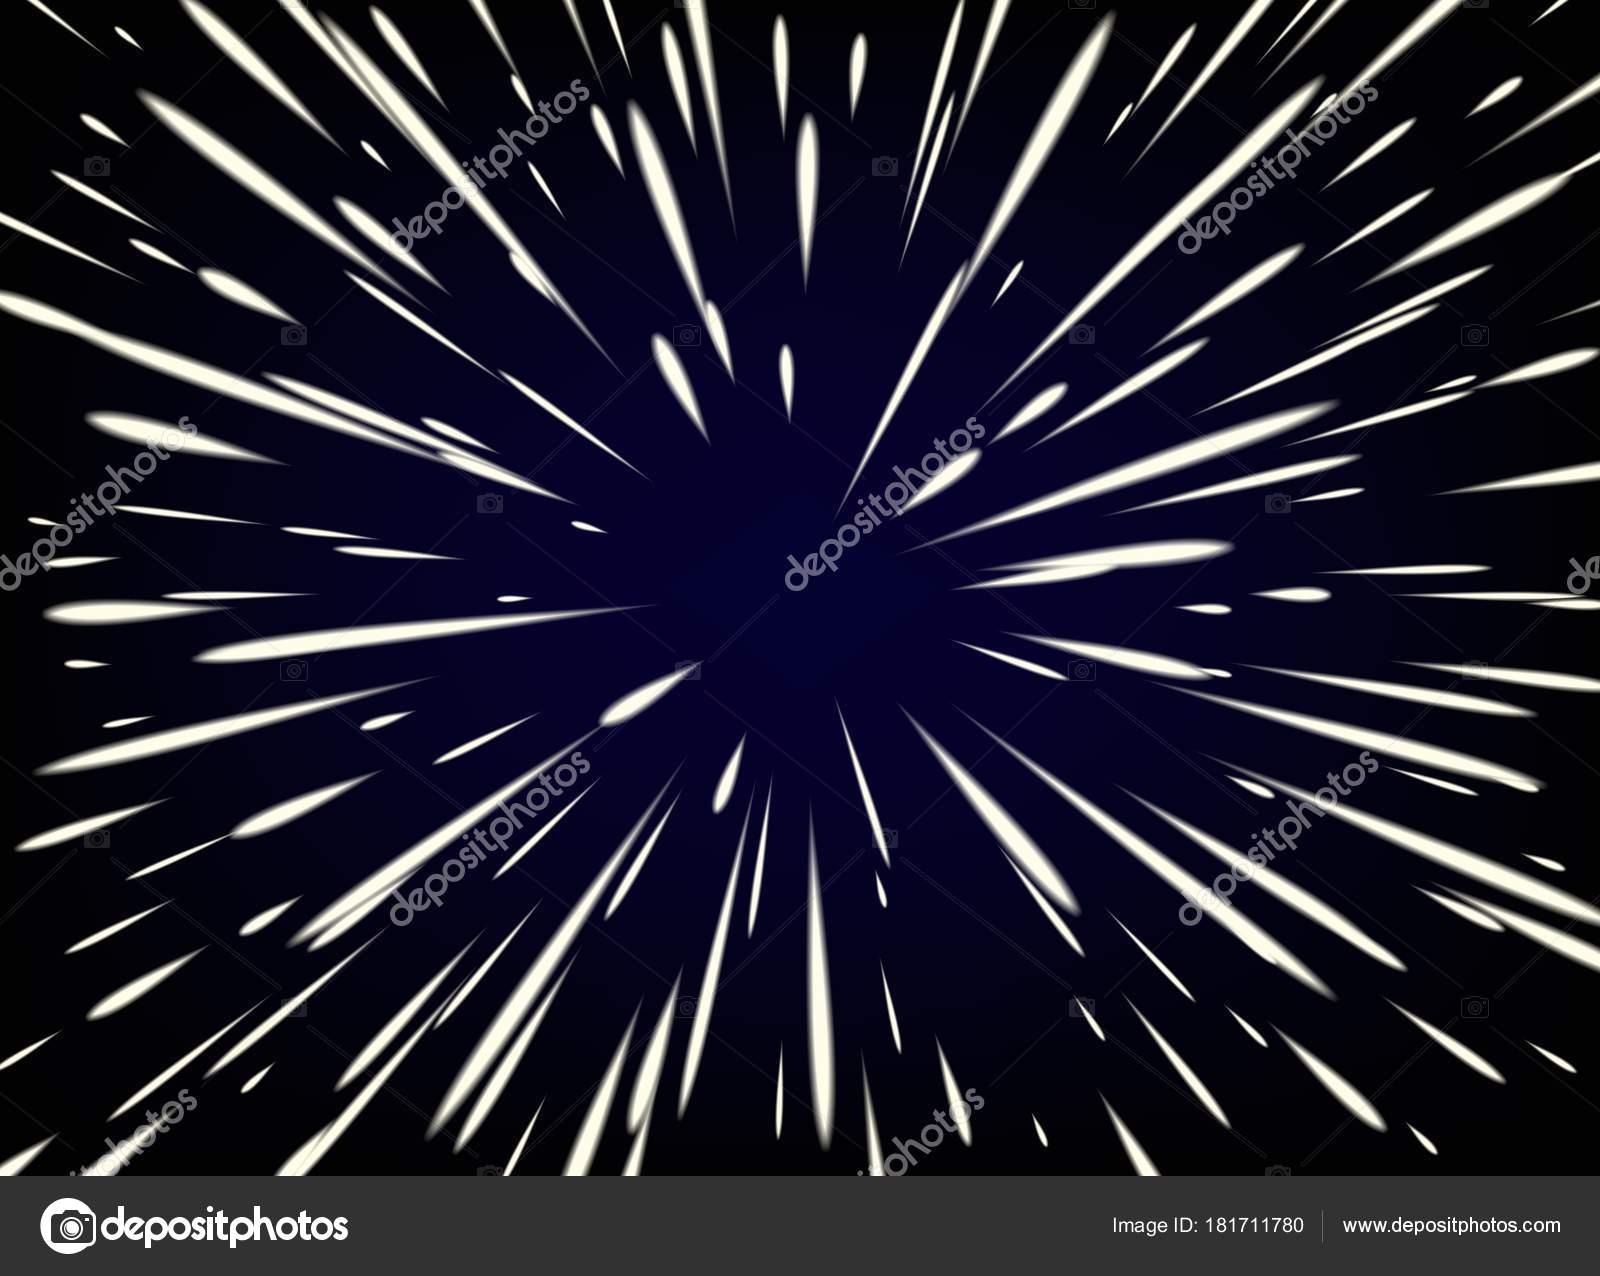 Áˆ Star Wars Portrait Wallpaper Stock Vectors Royalty Free Hyper Illustrations Download On Depositphotos